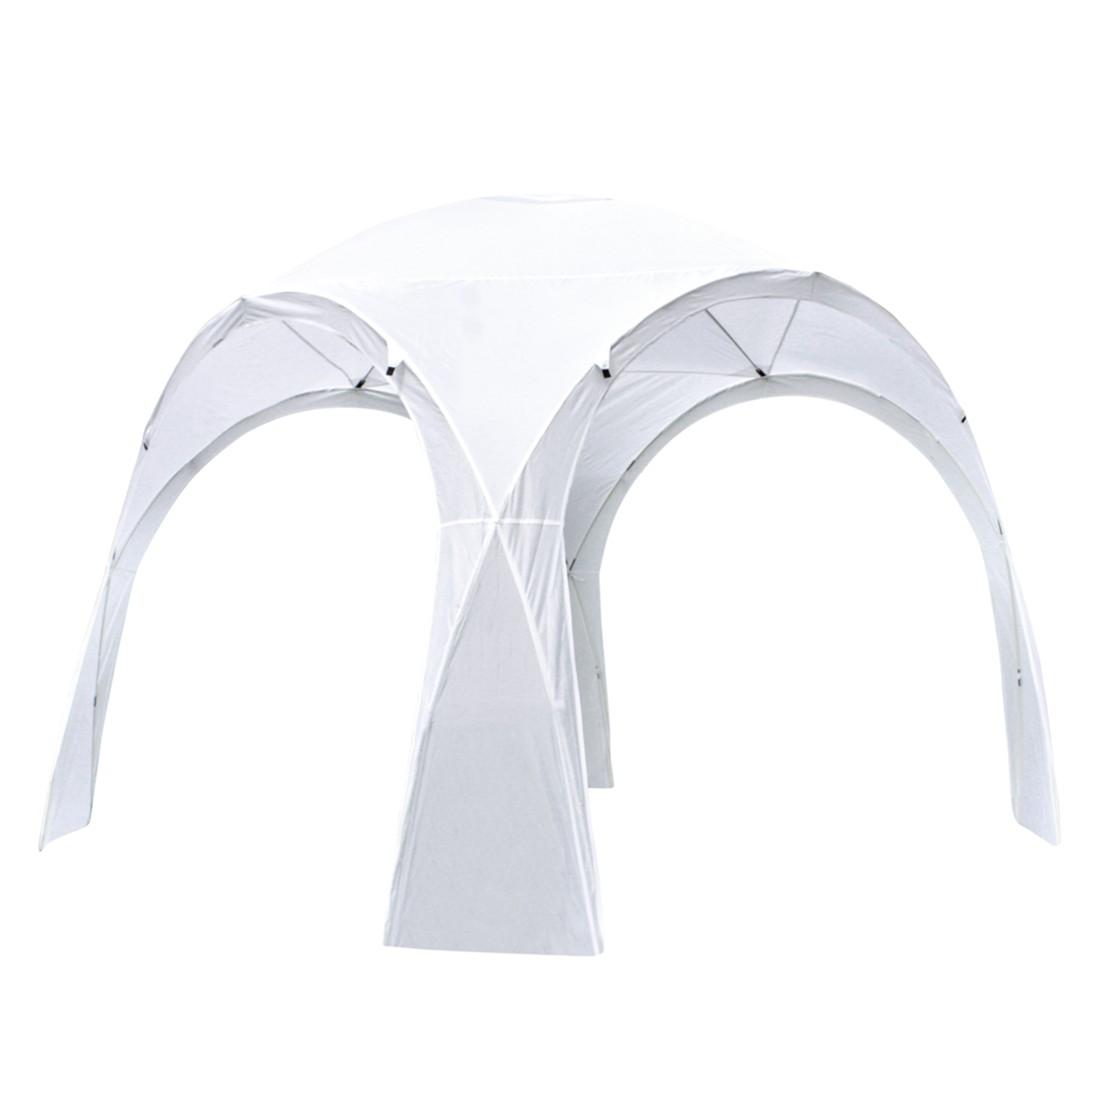 Pavillon Ardin - Polyethylen - Weiß, Garden Pleasure